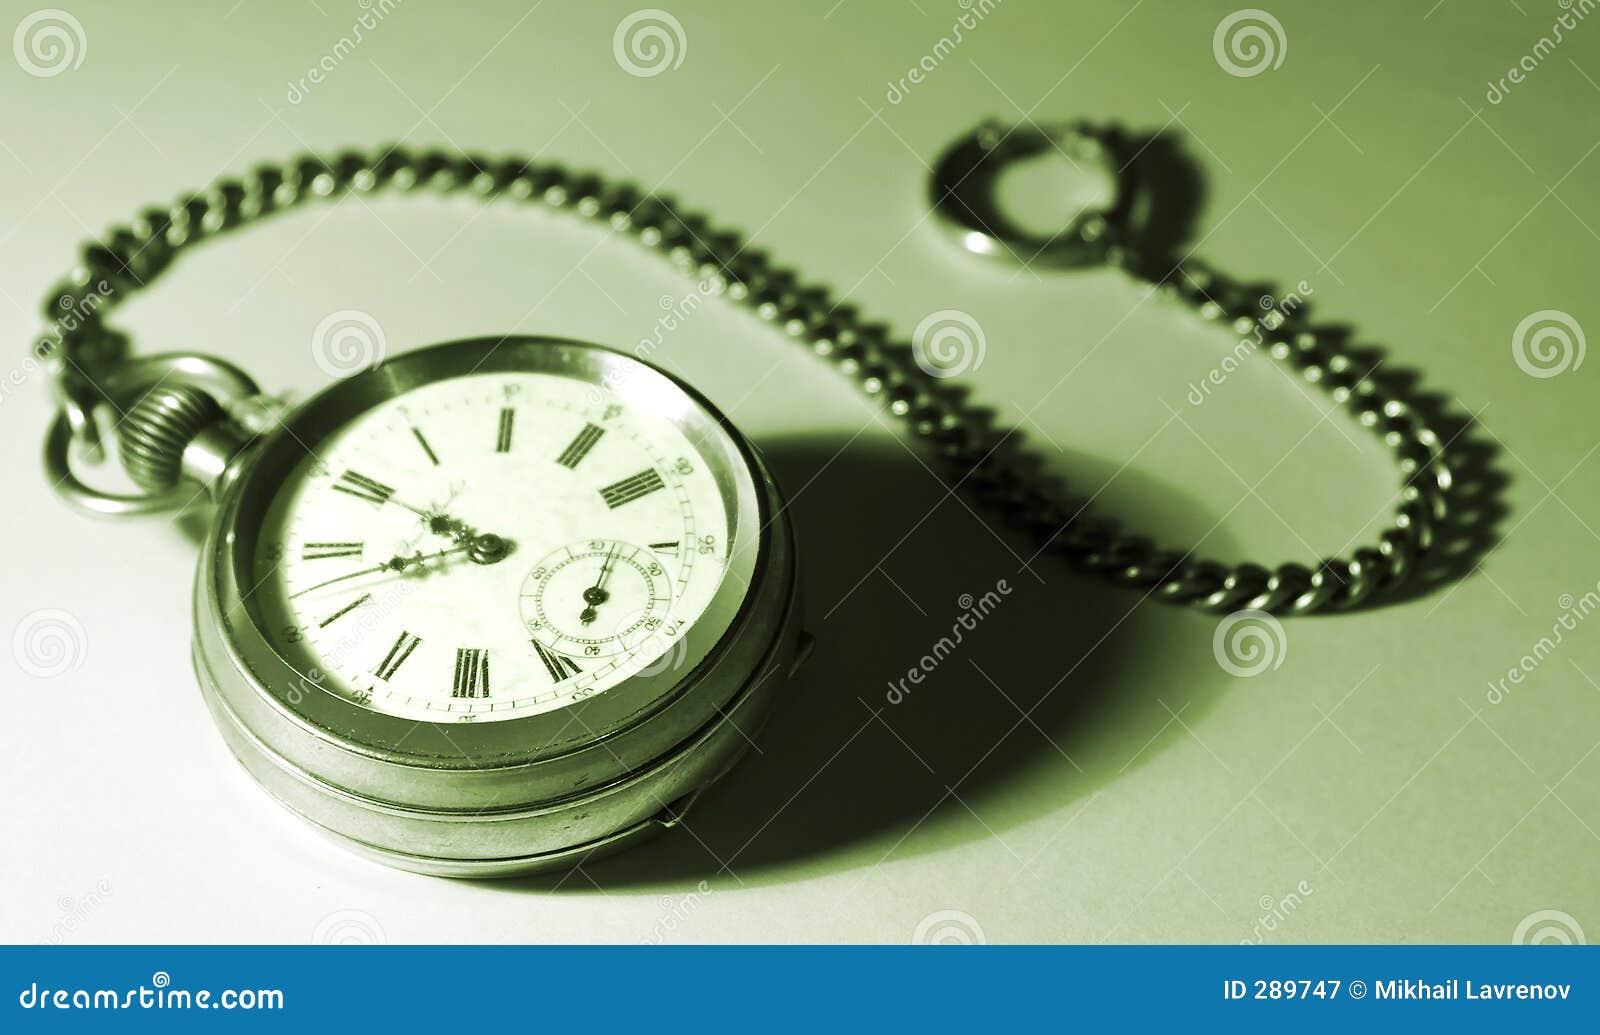 Chain grön isolerad fack tonad watch